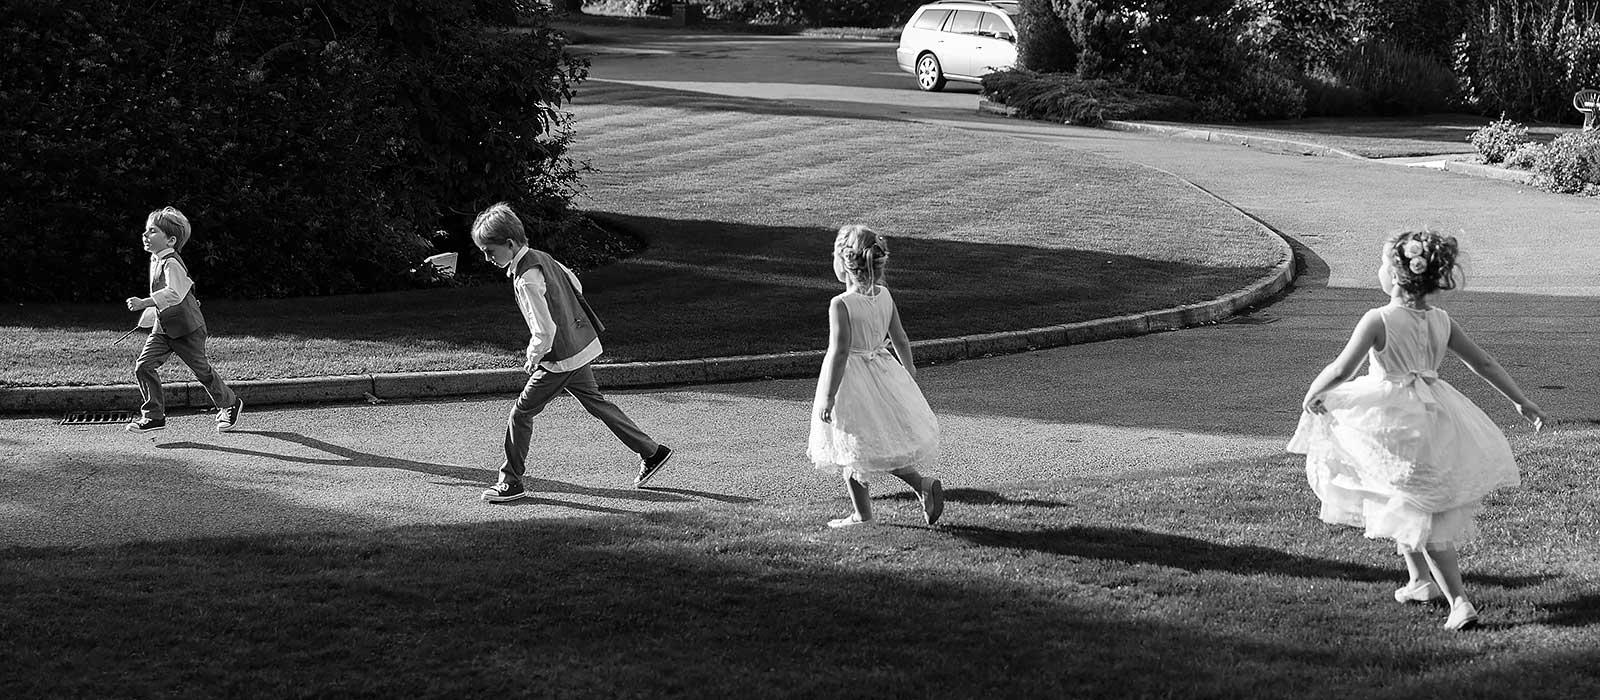 Manor House Hotel wedding photography | Donna & Darren